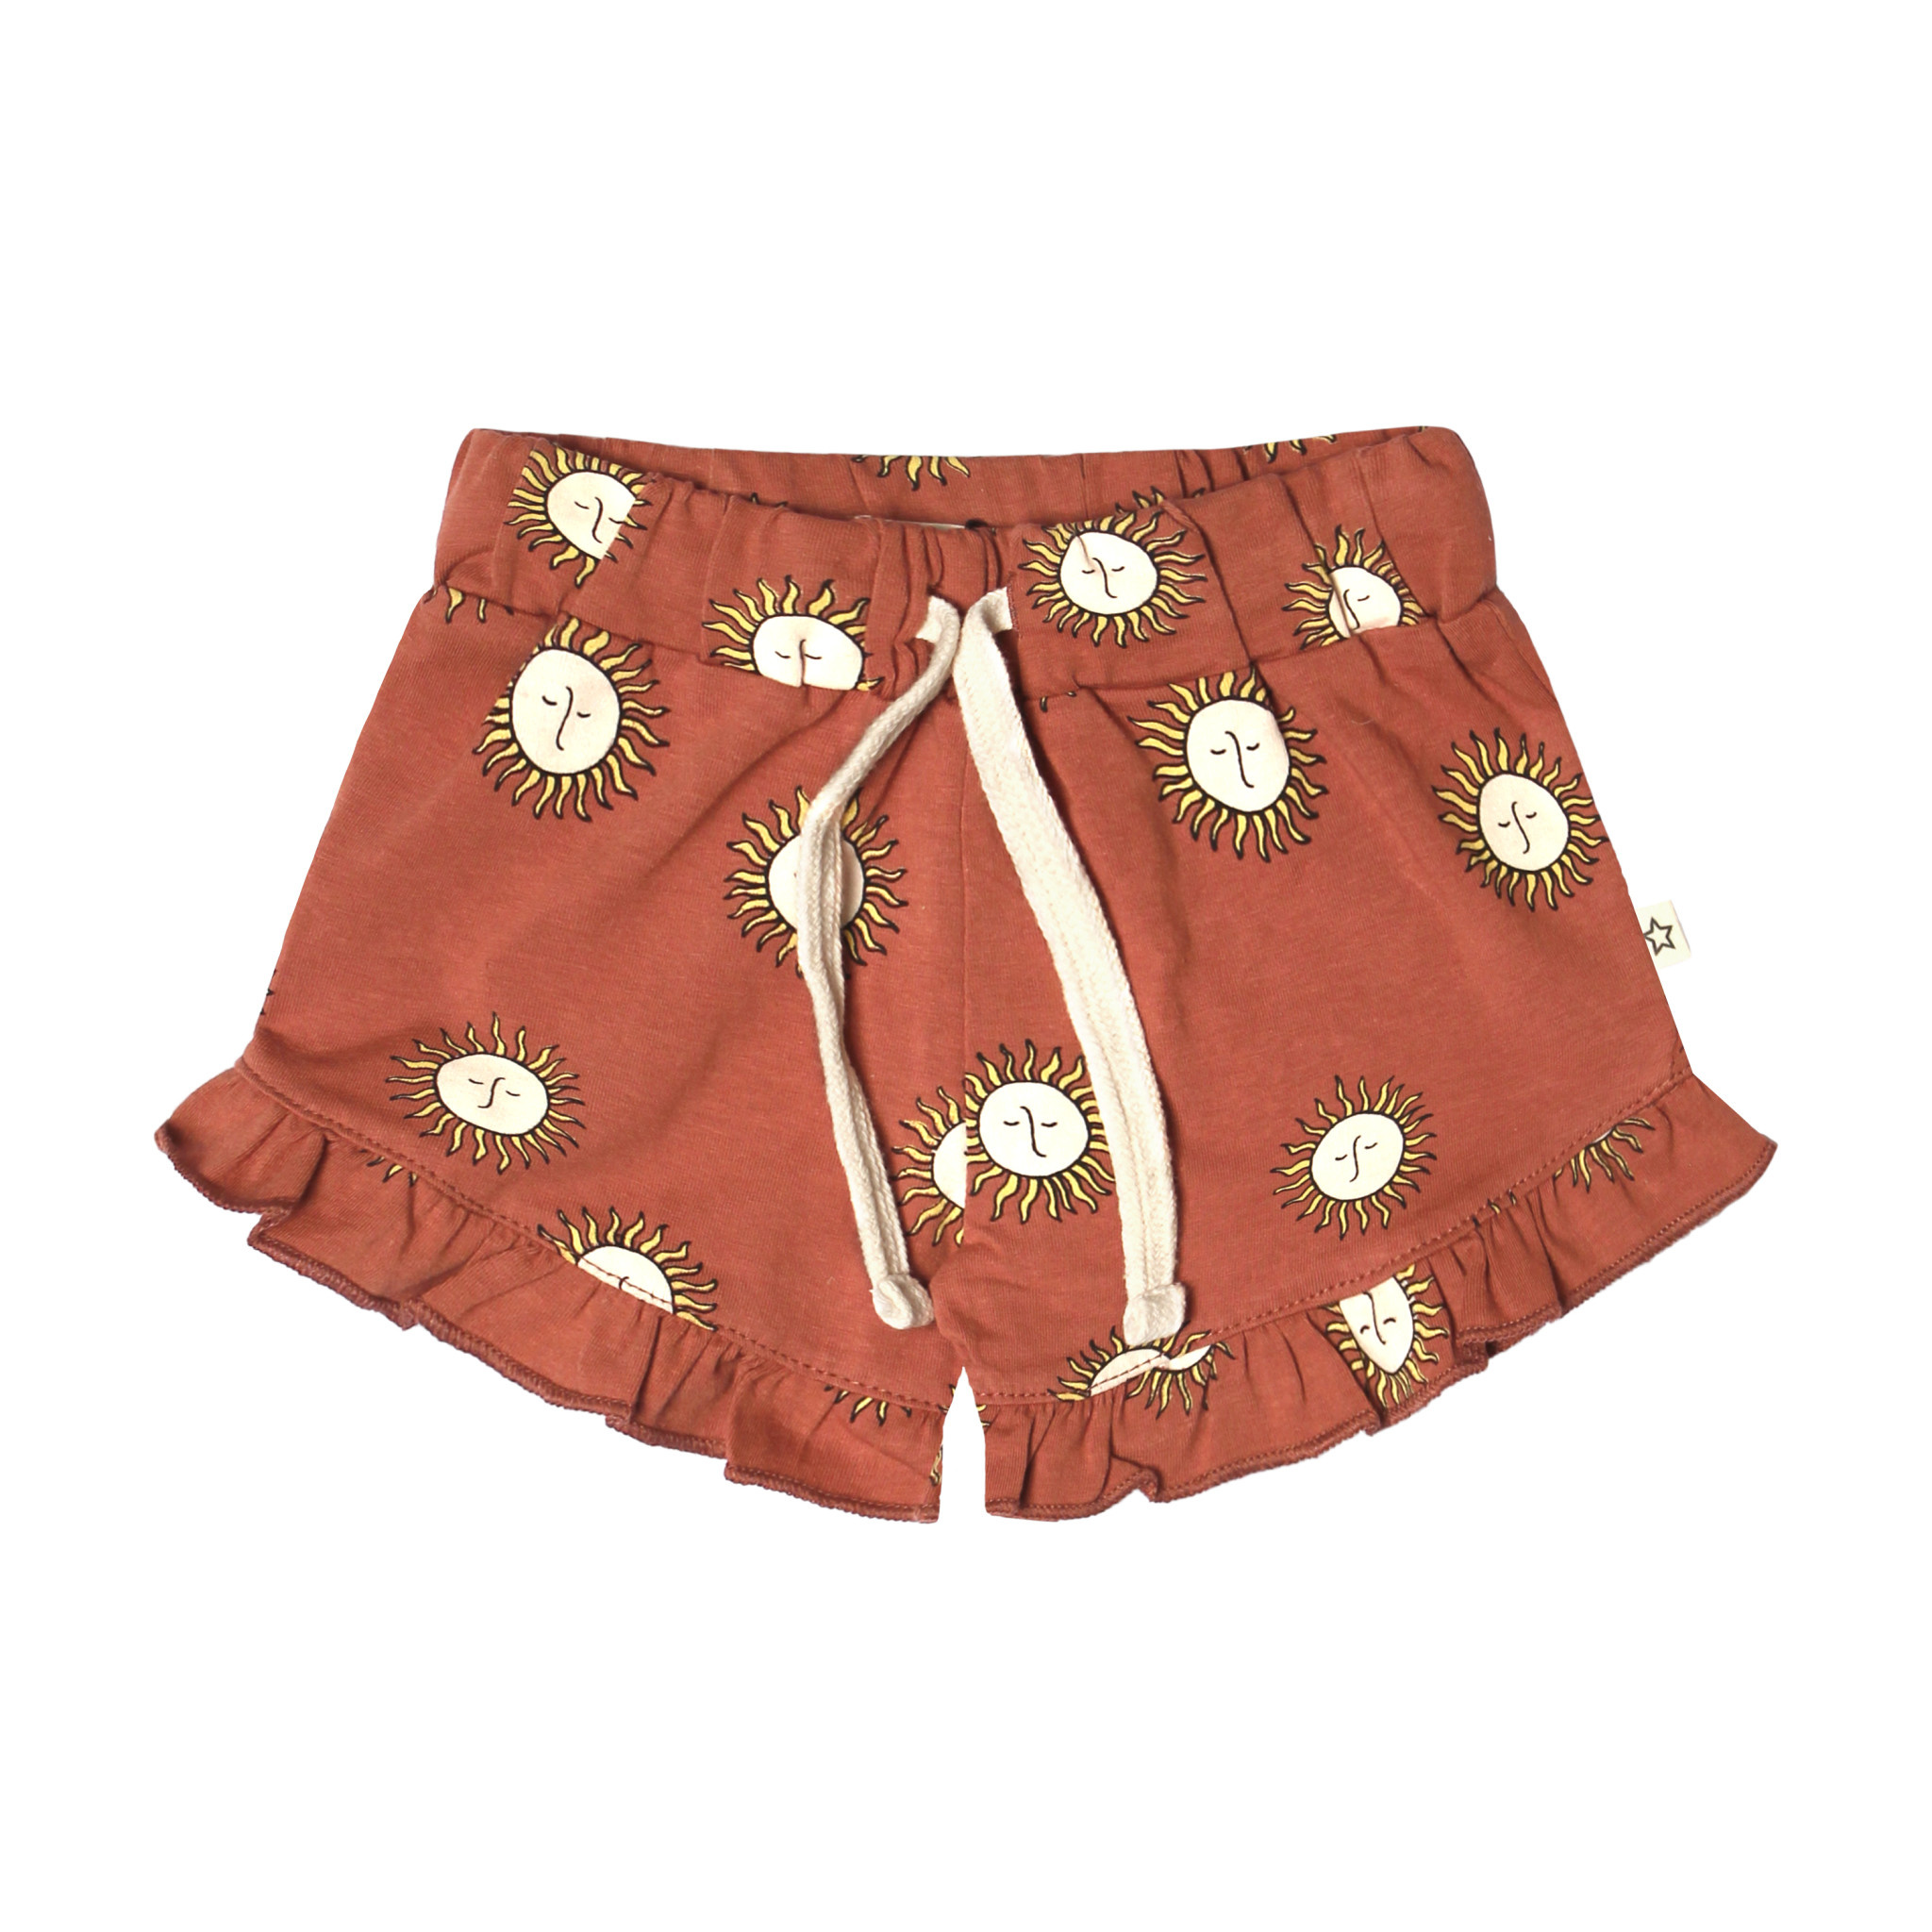 Your Wishes Sunny Ruffle Shorts